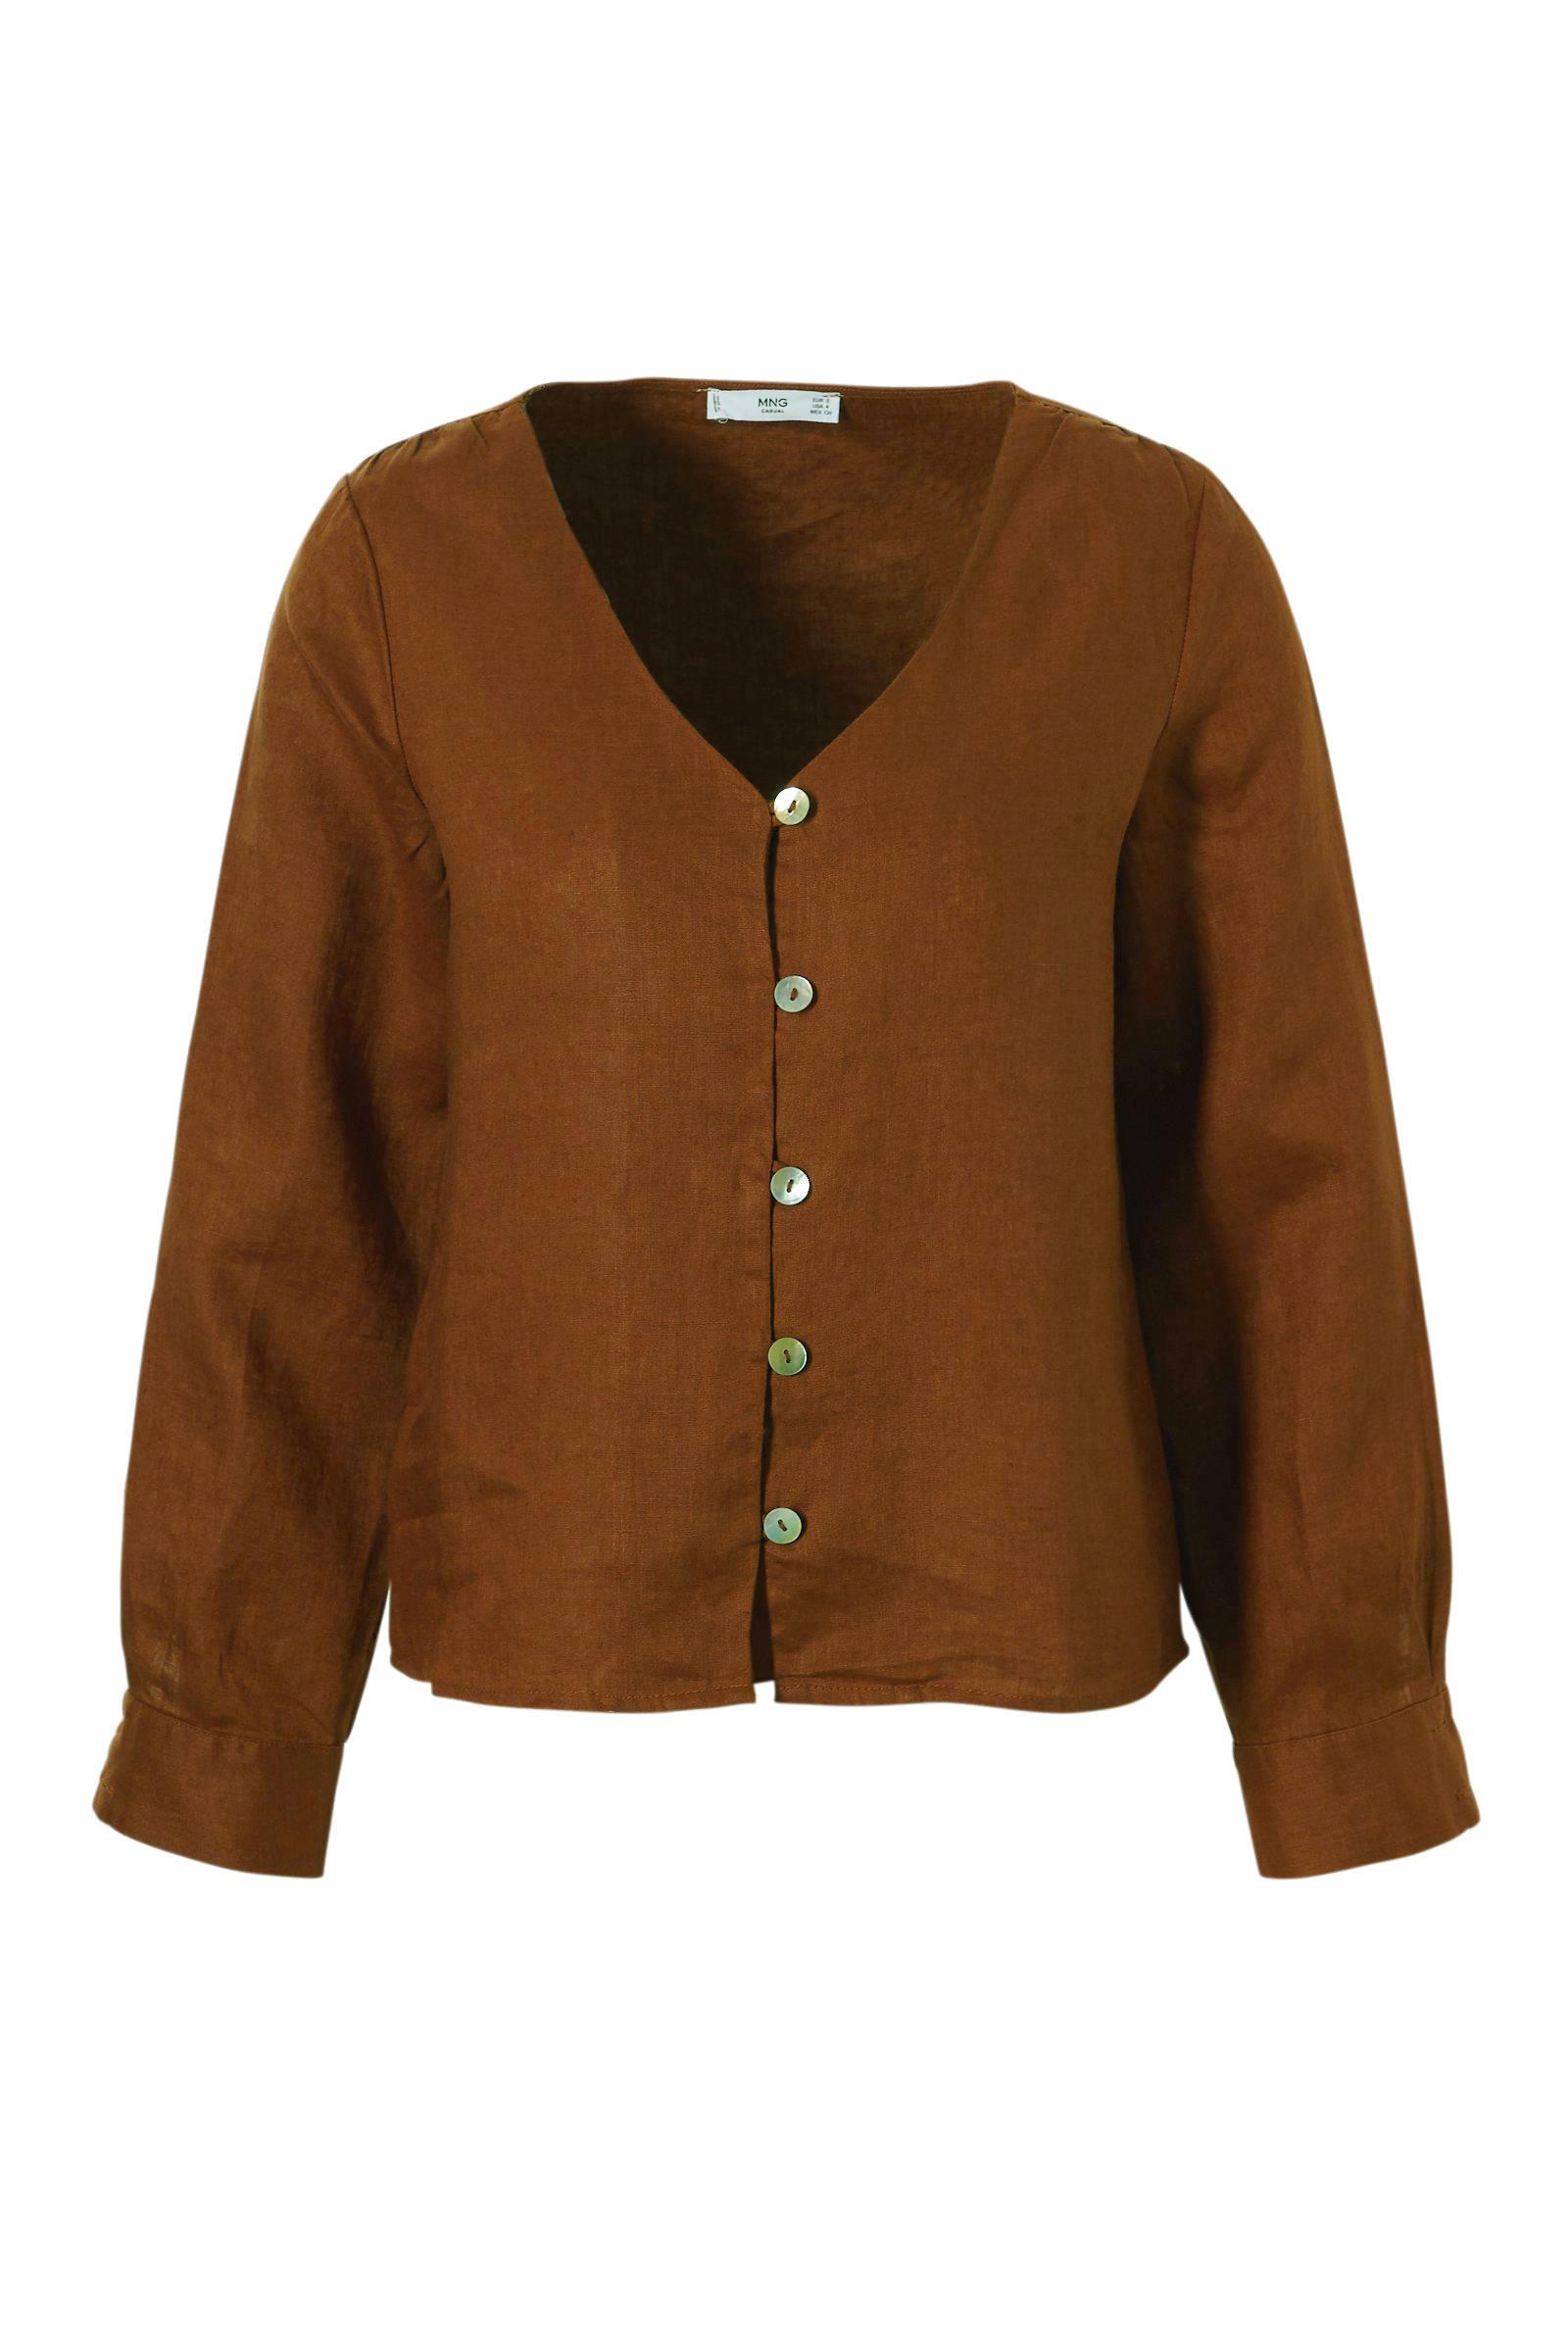 blouse blouse Mango Mango blouse koper Mango koper Mango koper koper blouse x1gwZcRSPq